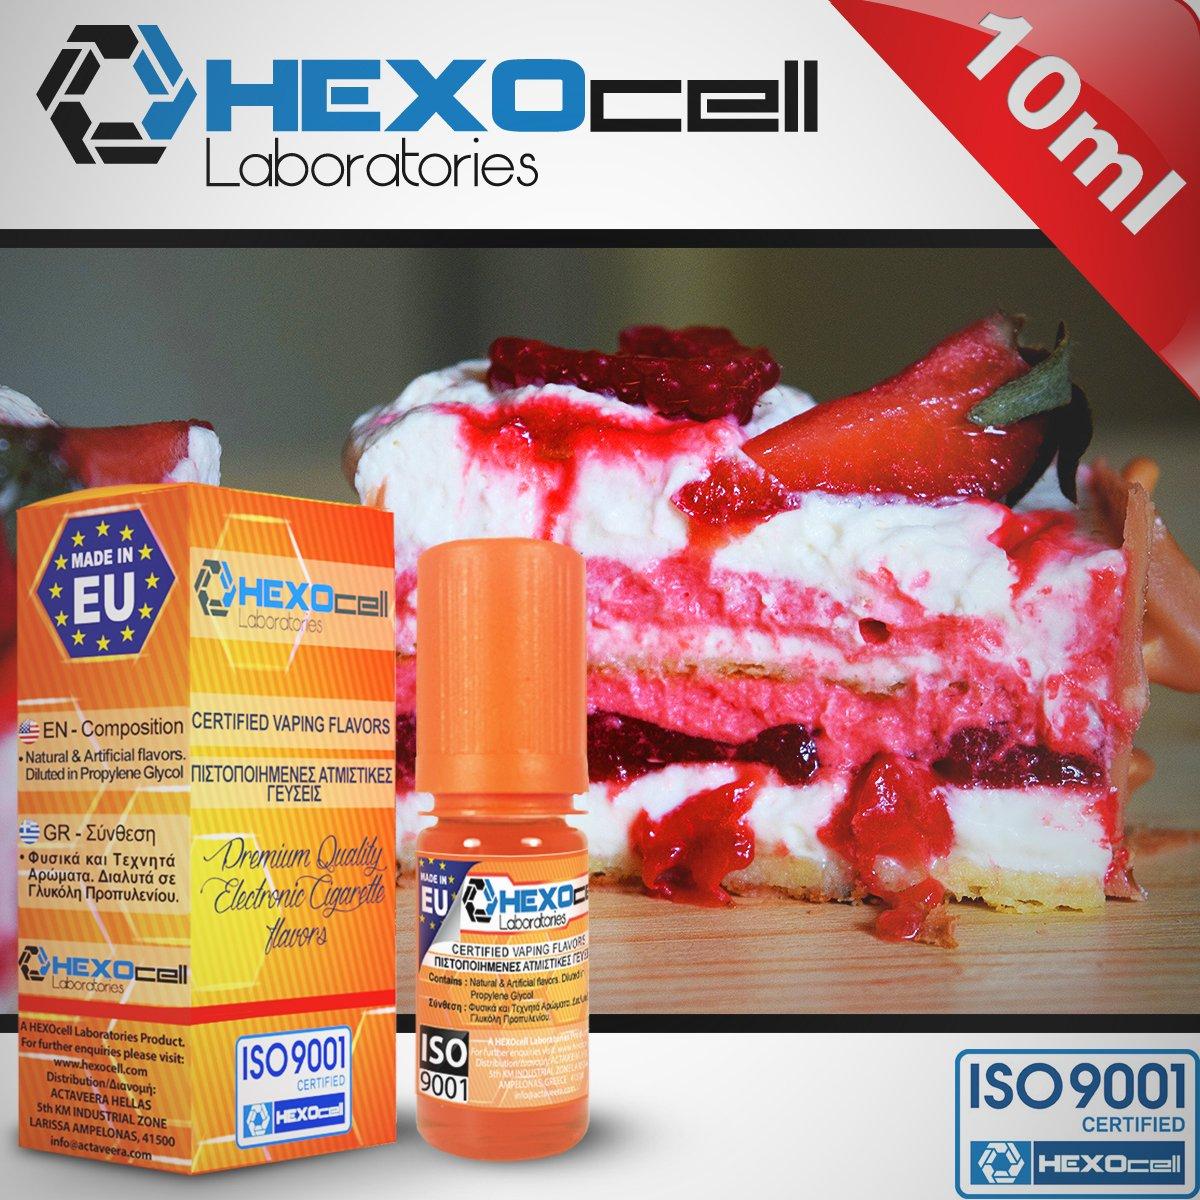 D.I.Y. - ΑΡΩΜΑ - HEXOCELL 10ML - BLOODLUST CREAM (ΕΞΩΤΙΚΑ ΦΡΟΥΤΑ, ΑΝΘΗ, ΒΑΝΙΛΙΑ & ΜΠΙΣΚΟΤΟ) - 10%